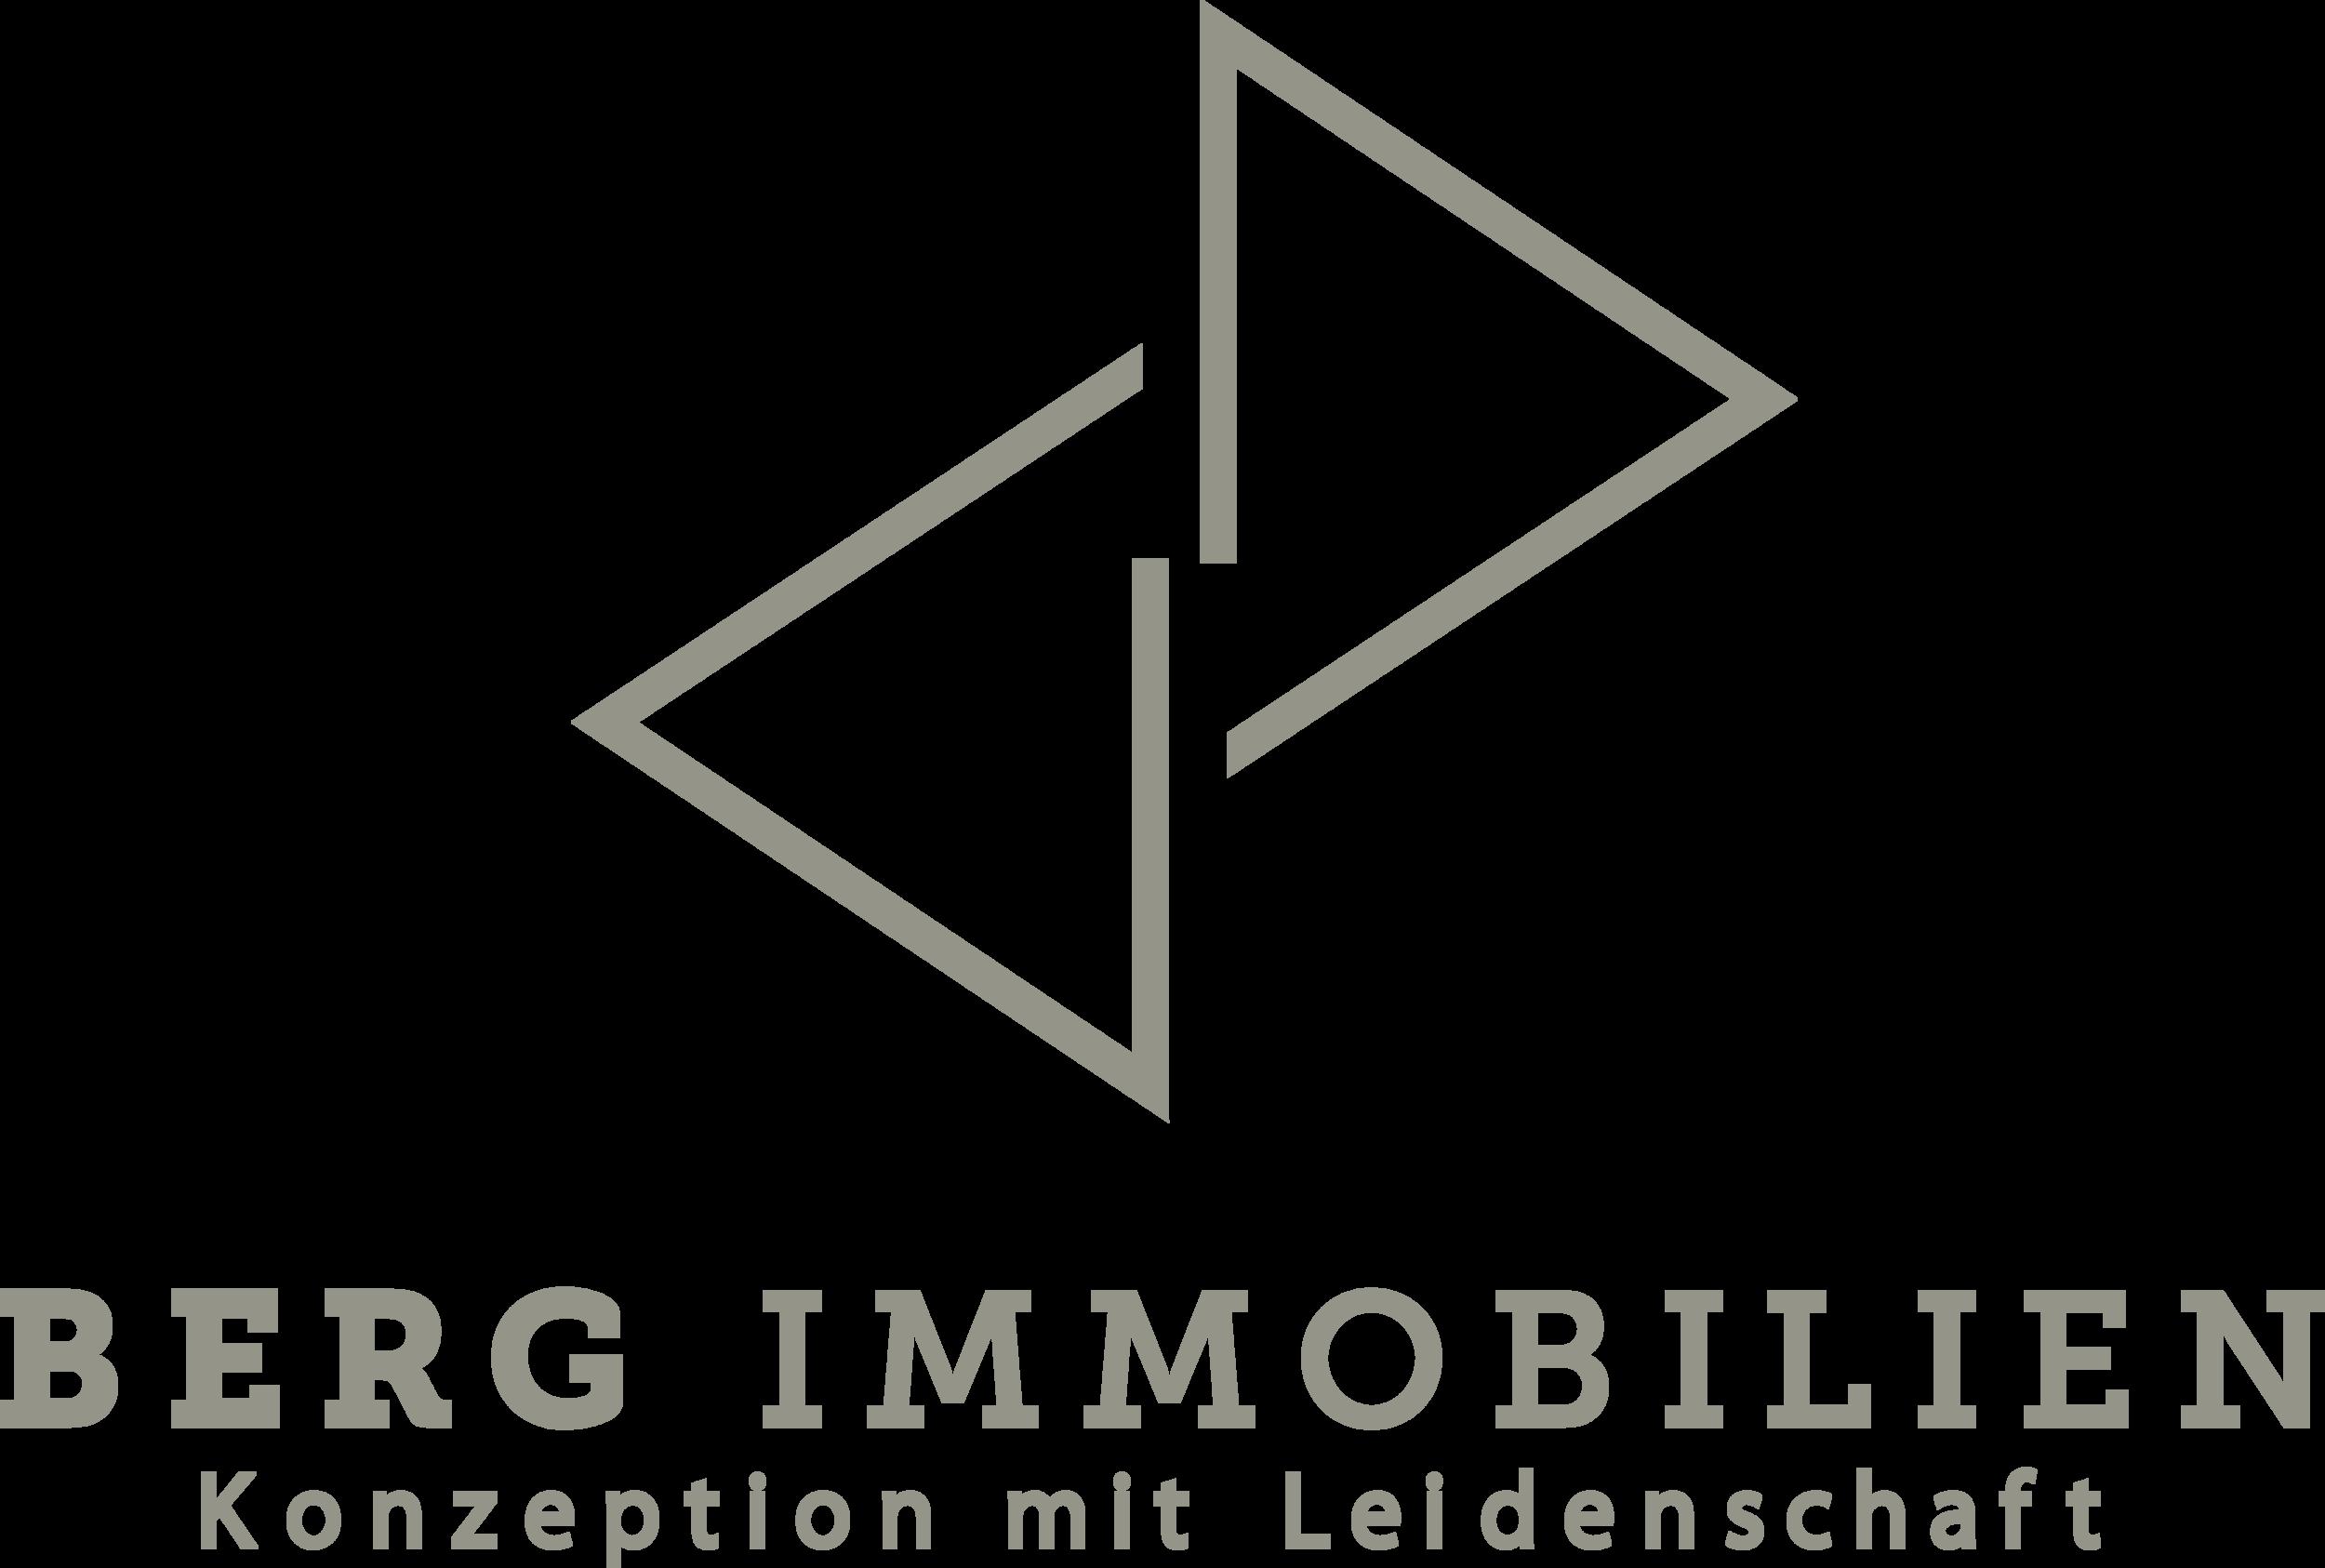 BERG IMMOBILIEN